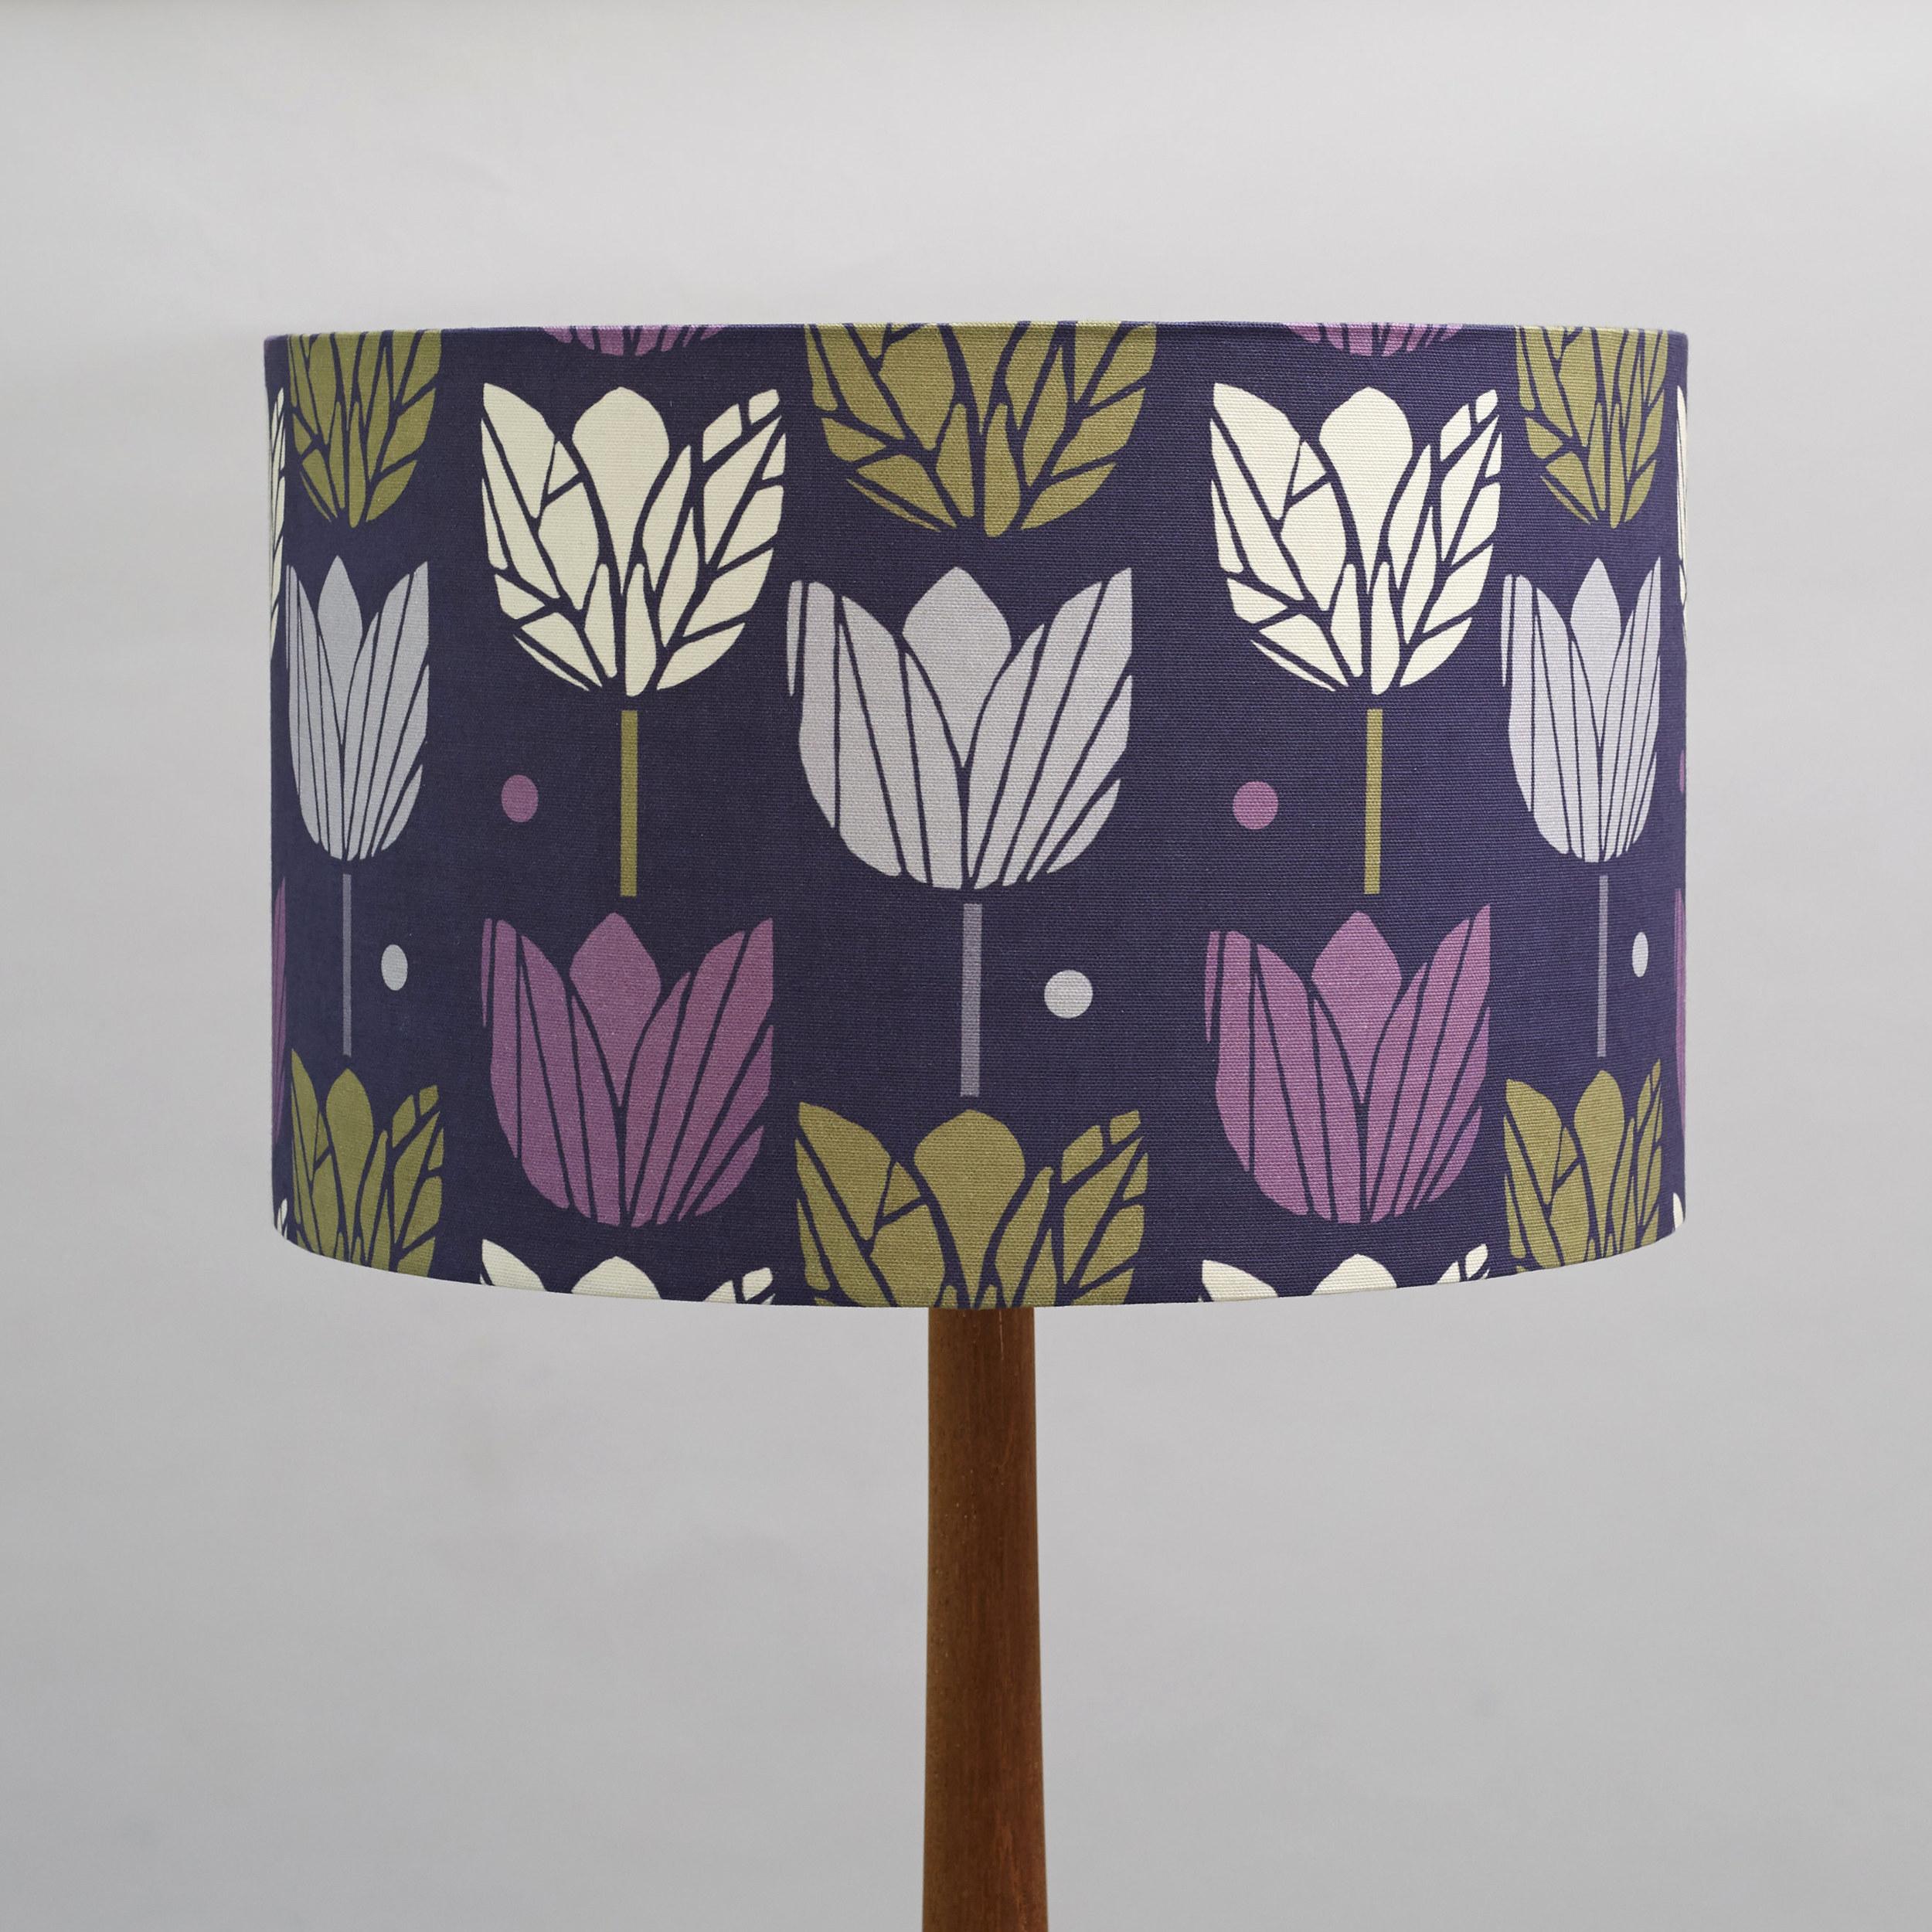 large lampshade in purple tulips.jpg